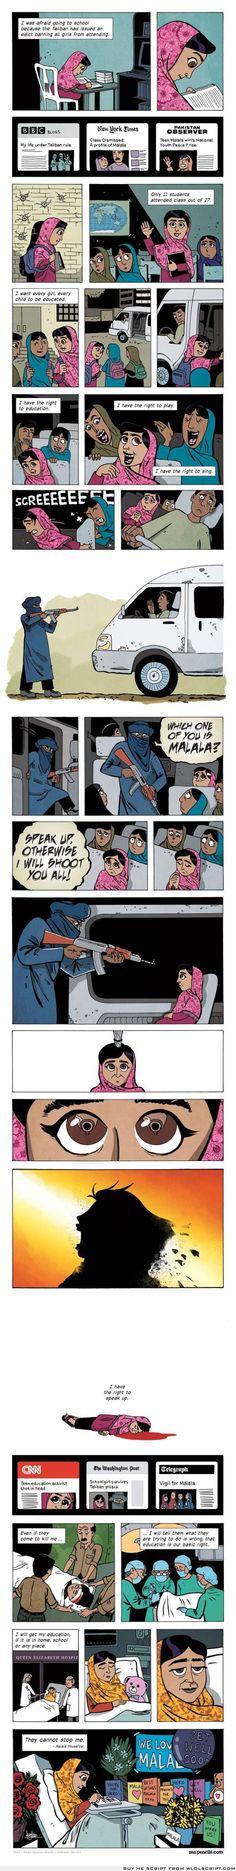 Malala Yousafzai- the 15 year old Pakistani girl who was shot in the head